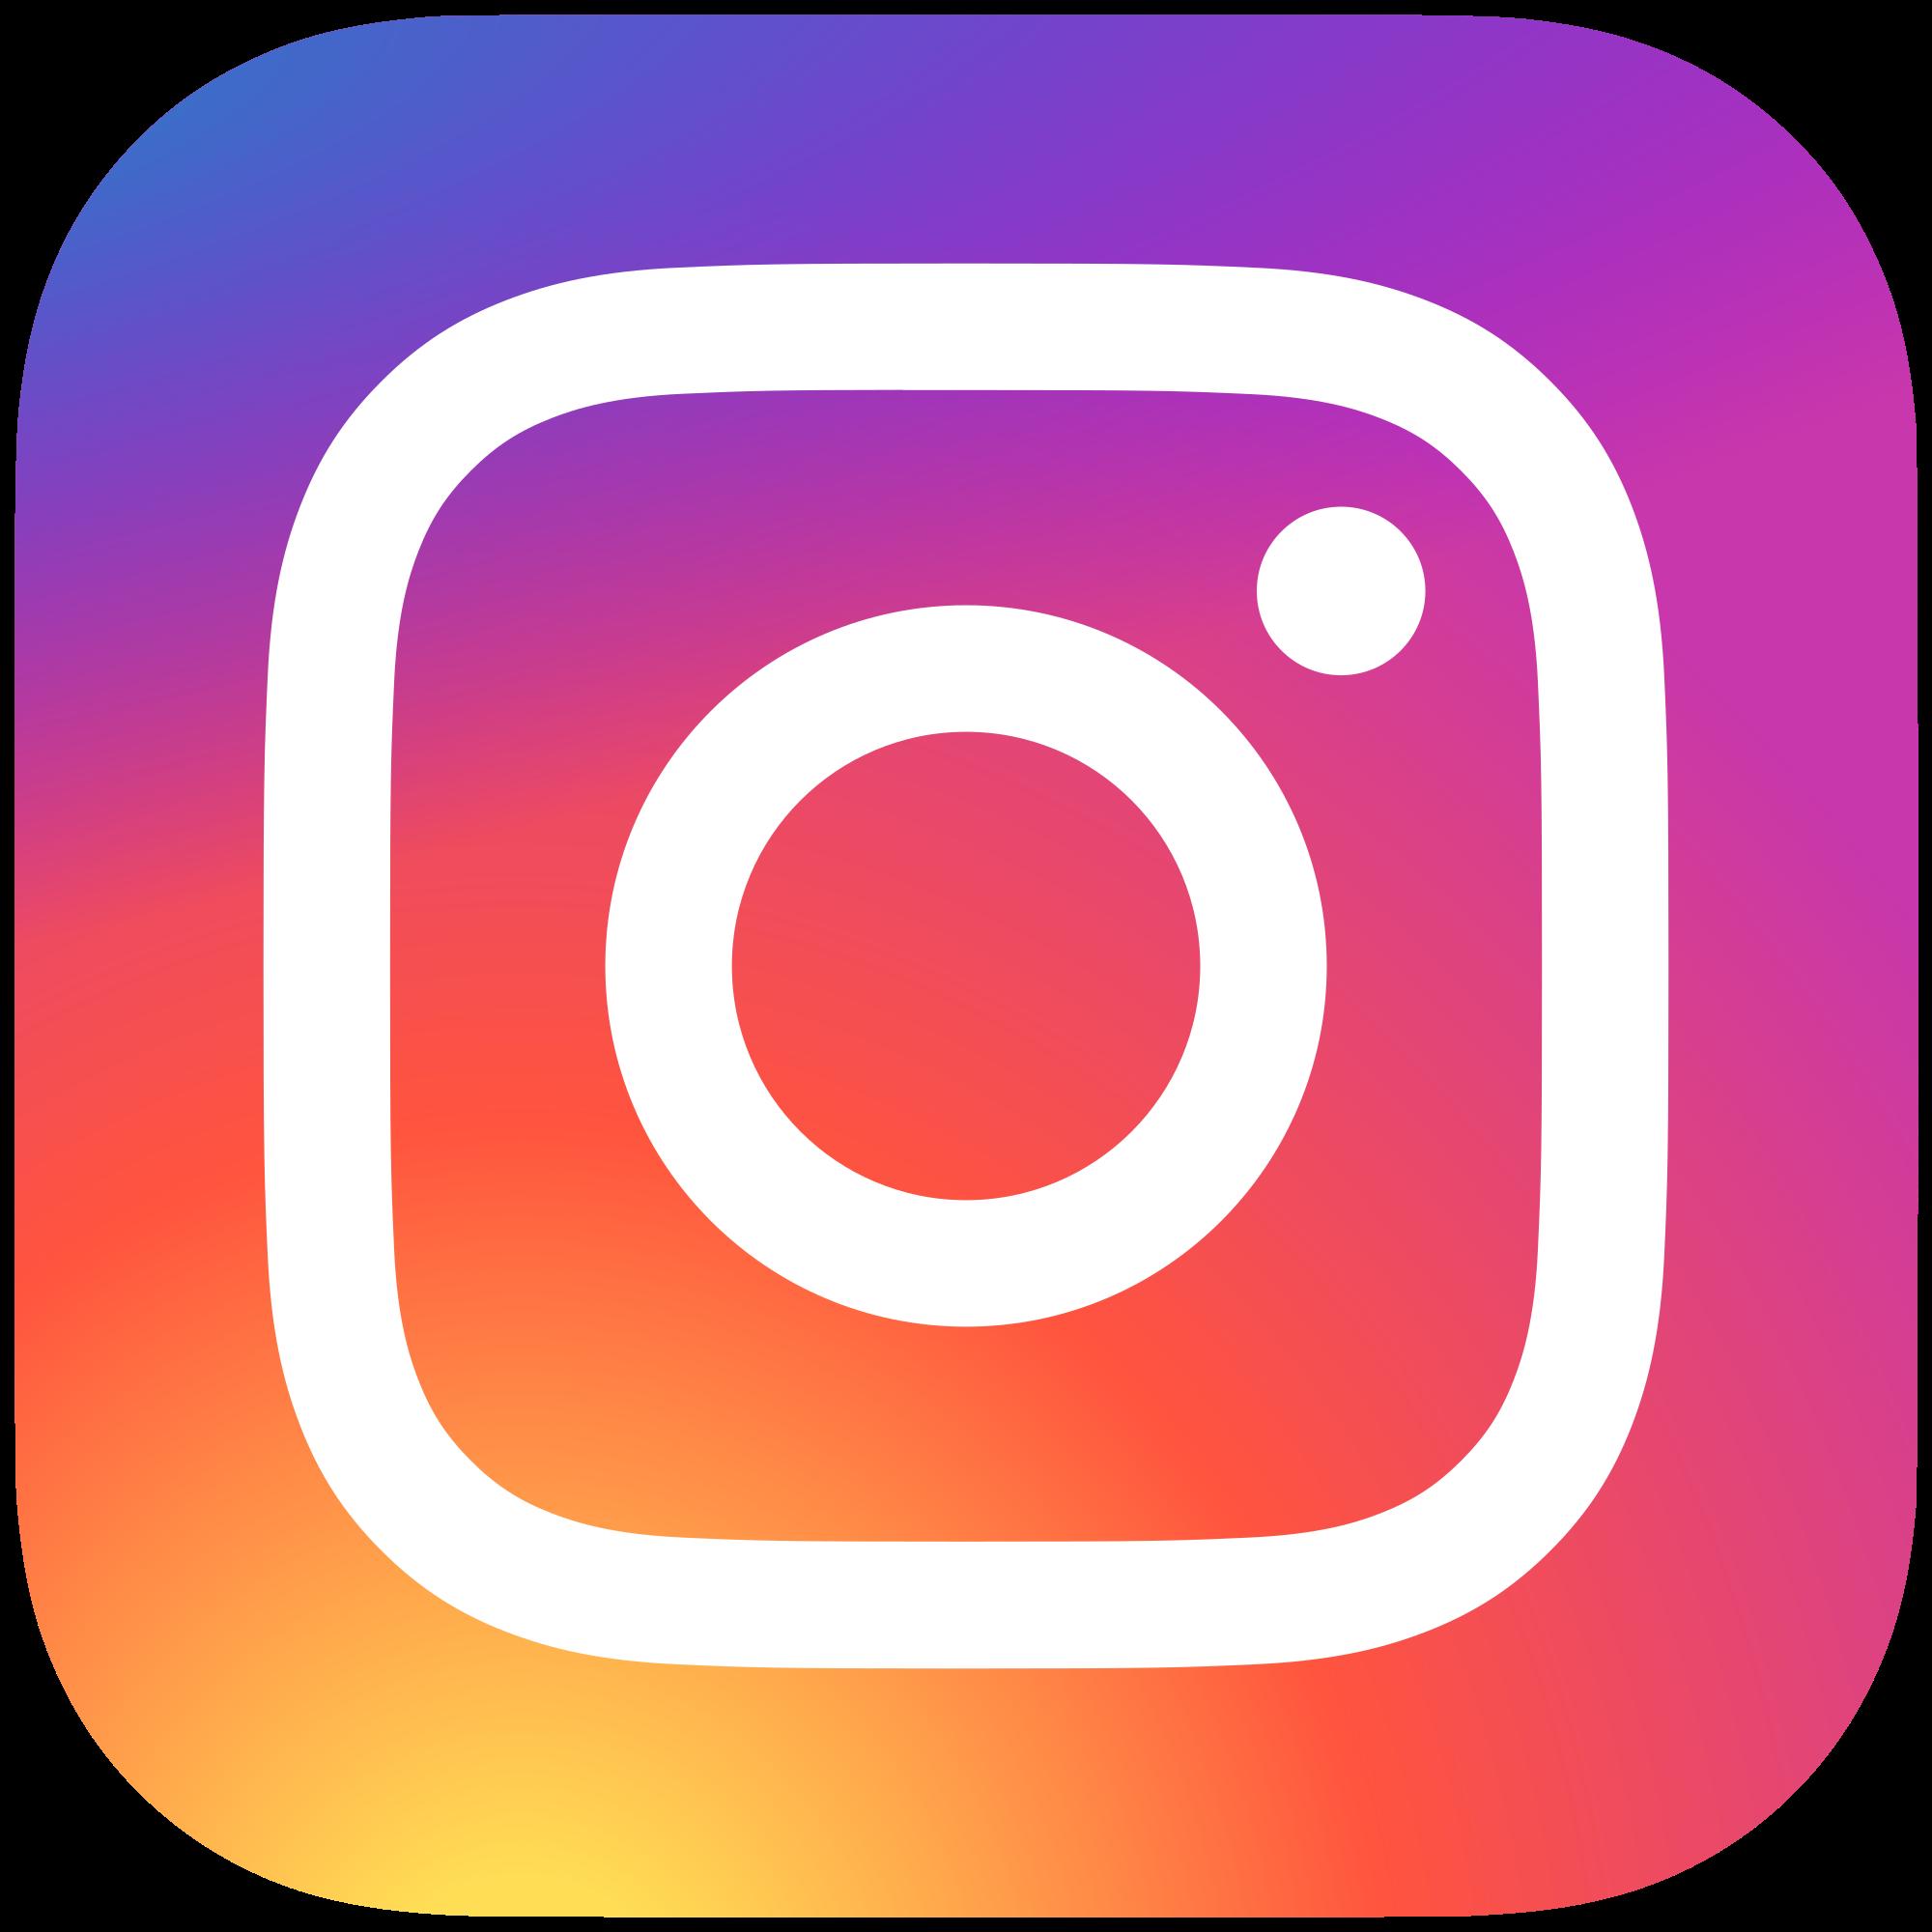 Logo Instagram Png - Open Hdpng.com , Transparent background PNG HD thumbnail